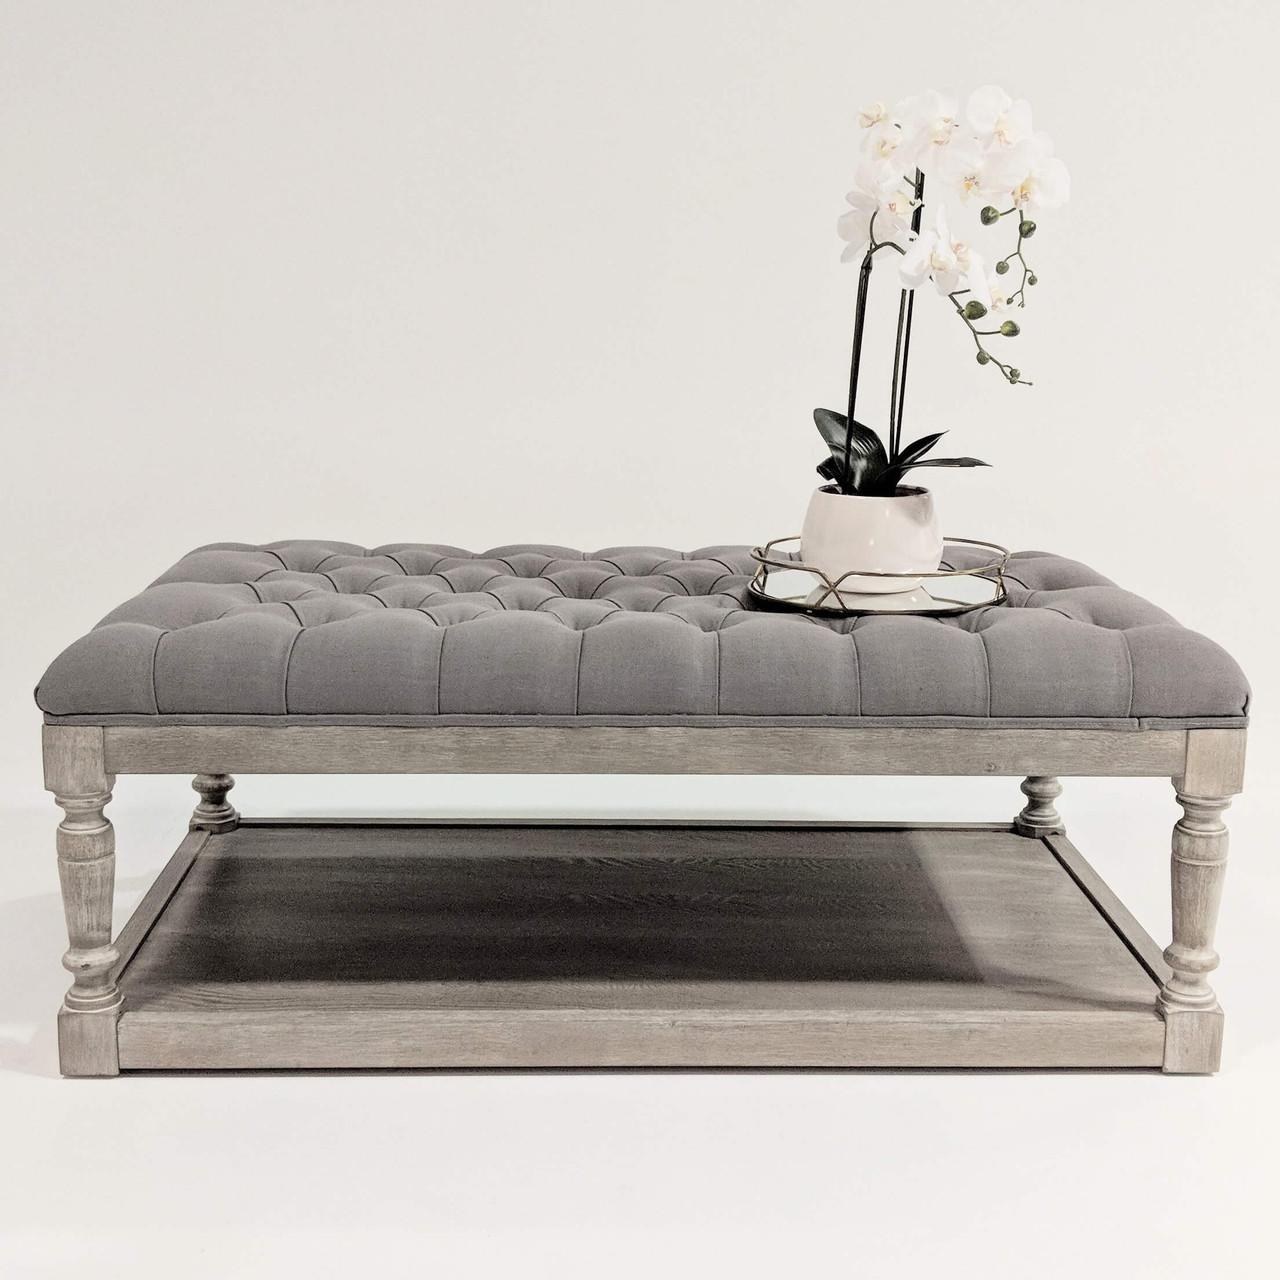 - Hamptons Oak Chesterfield Tufted Coffee Table Ottoman With Shelf